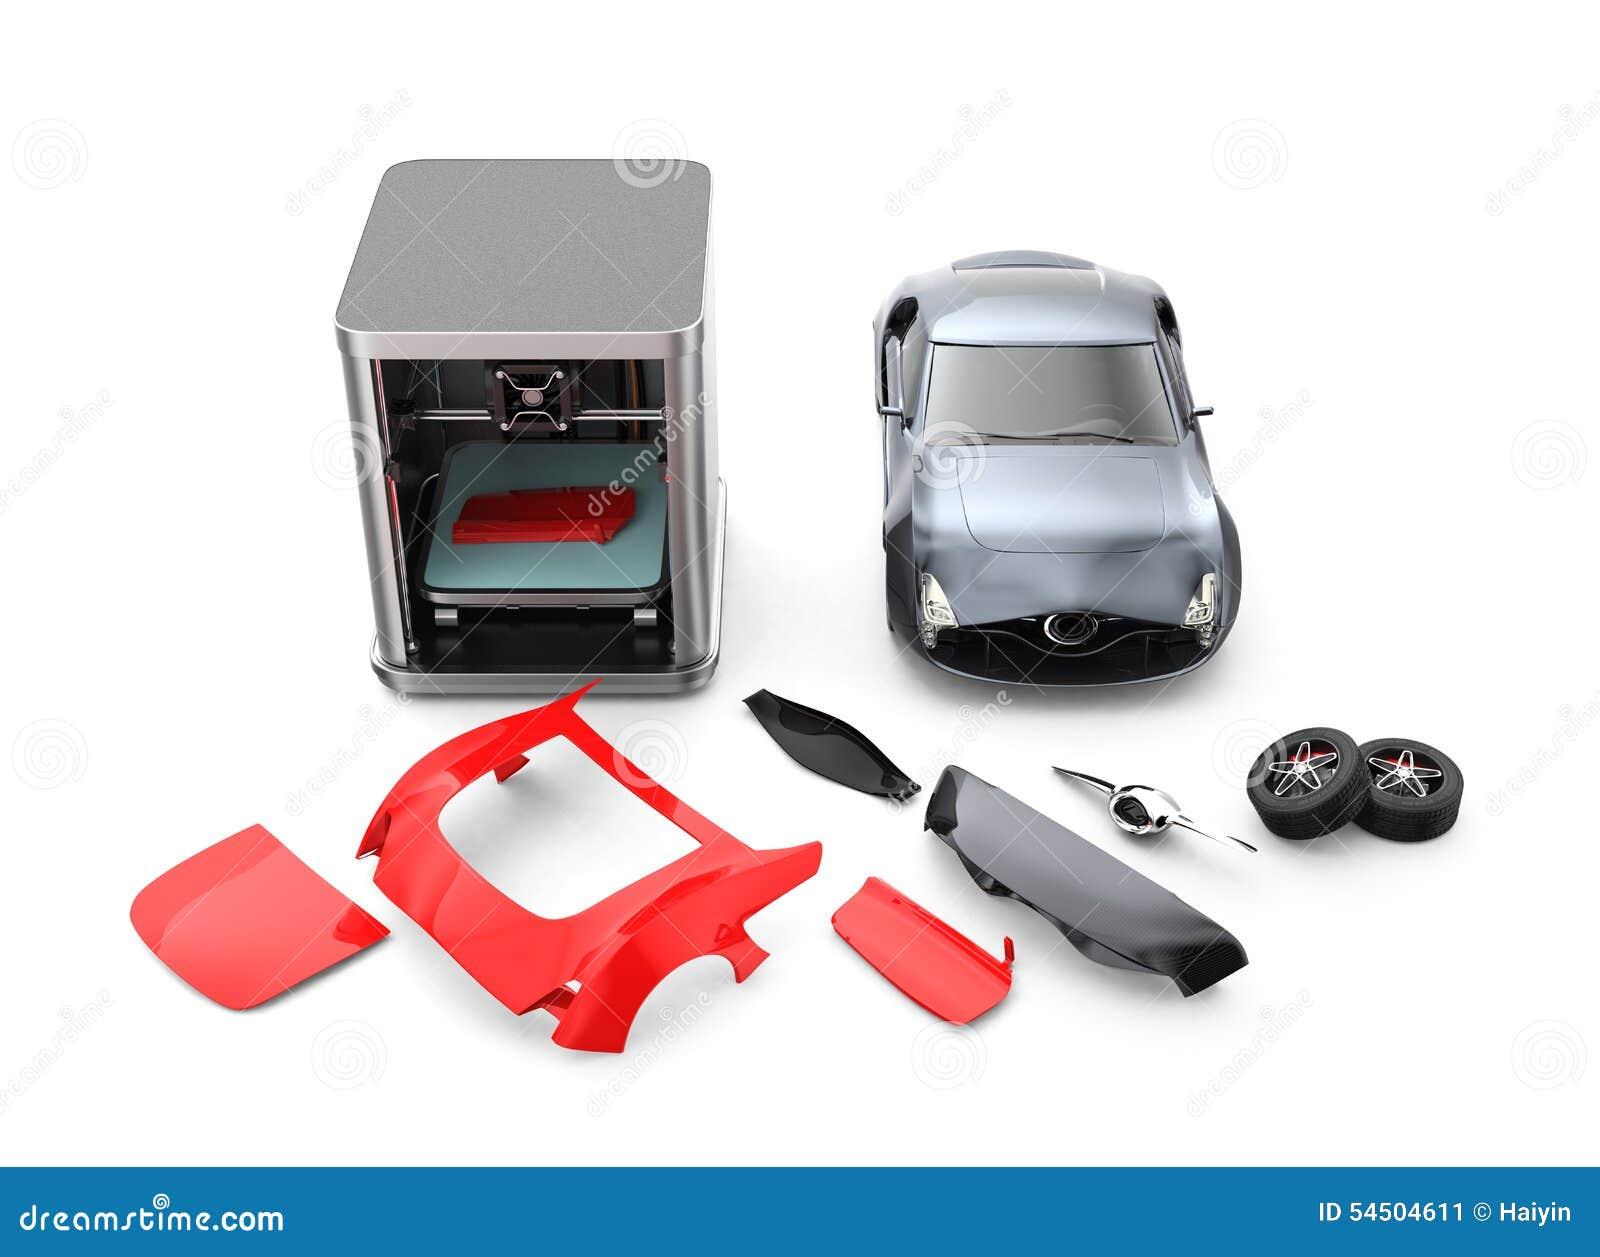 3D Printer Printing Car Body Parts Stock Image - Image of